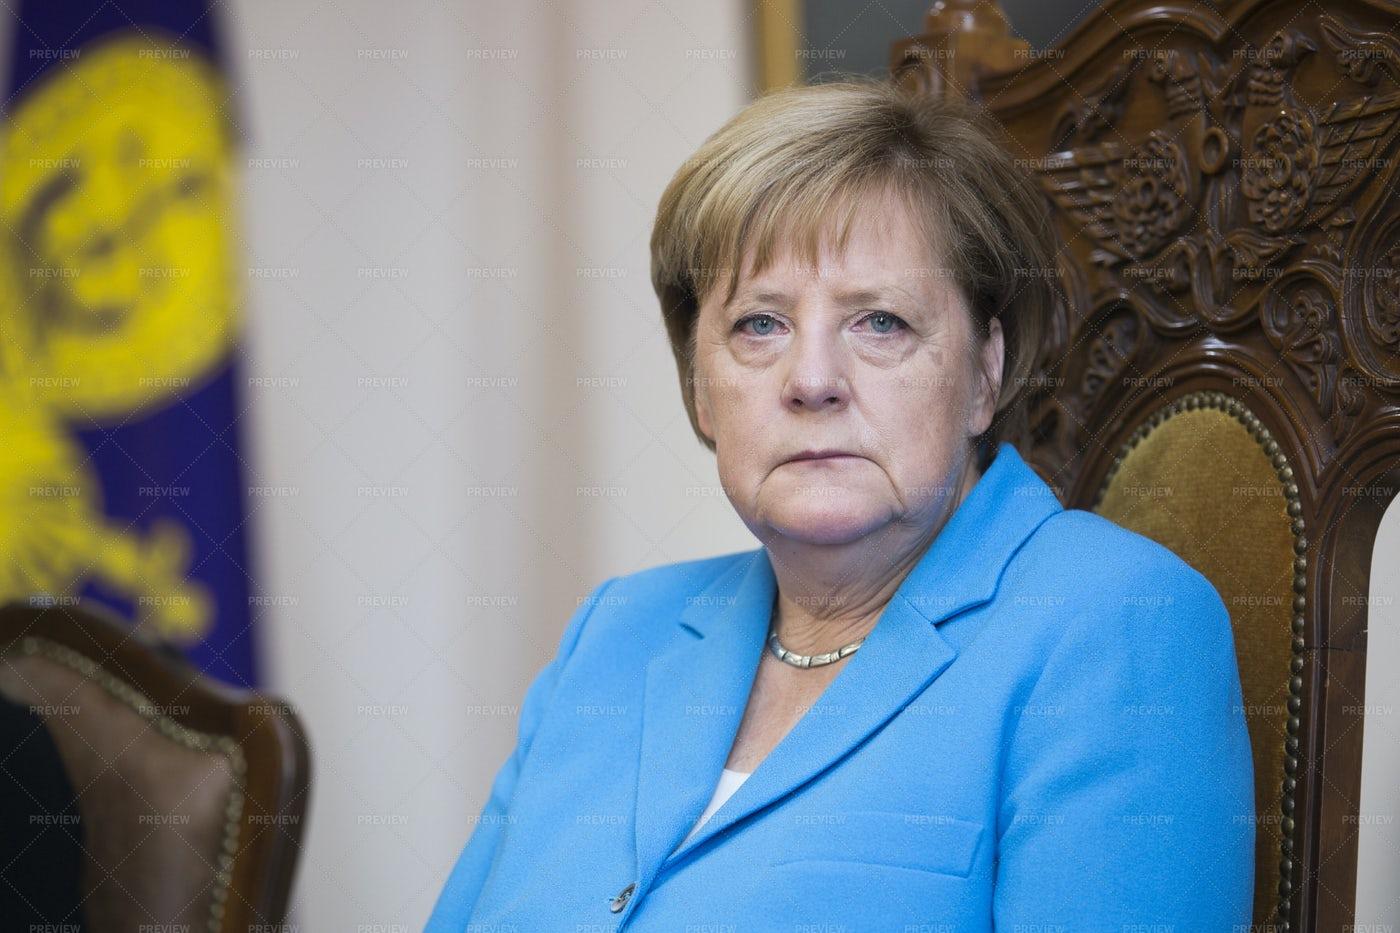 German Chancellor Angela Merkel: Stock Photos